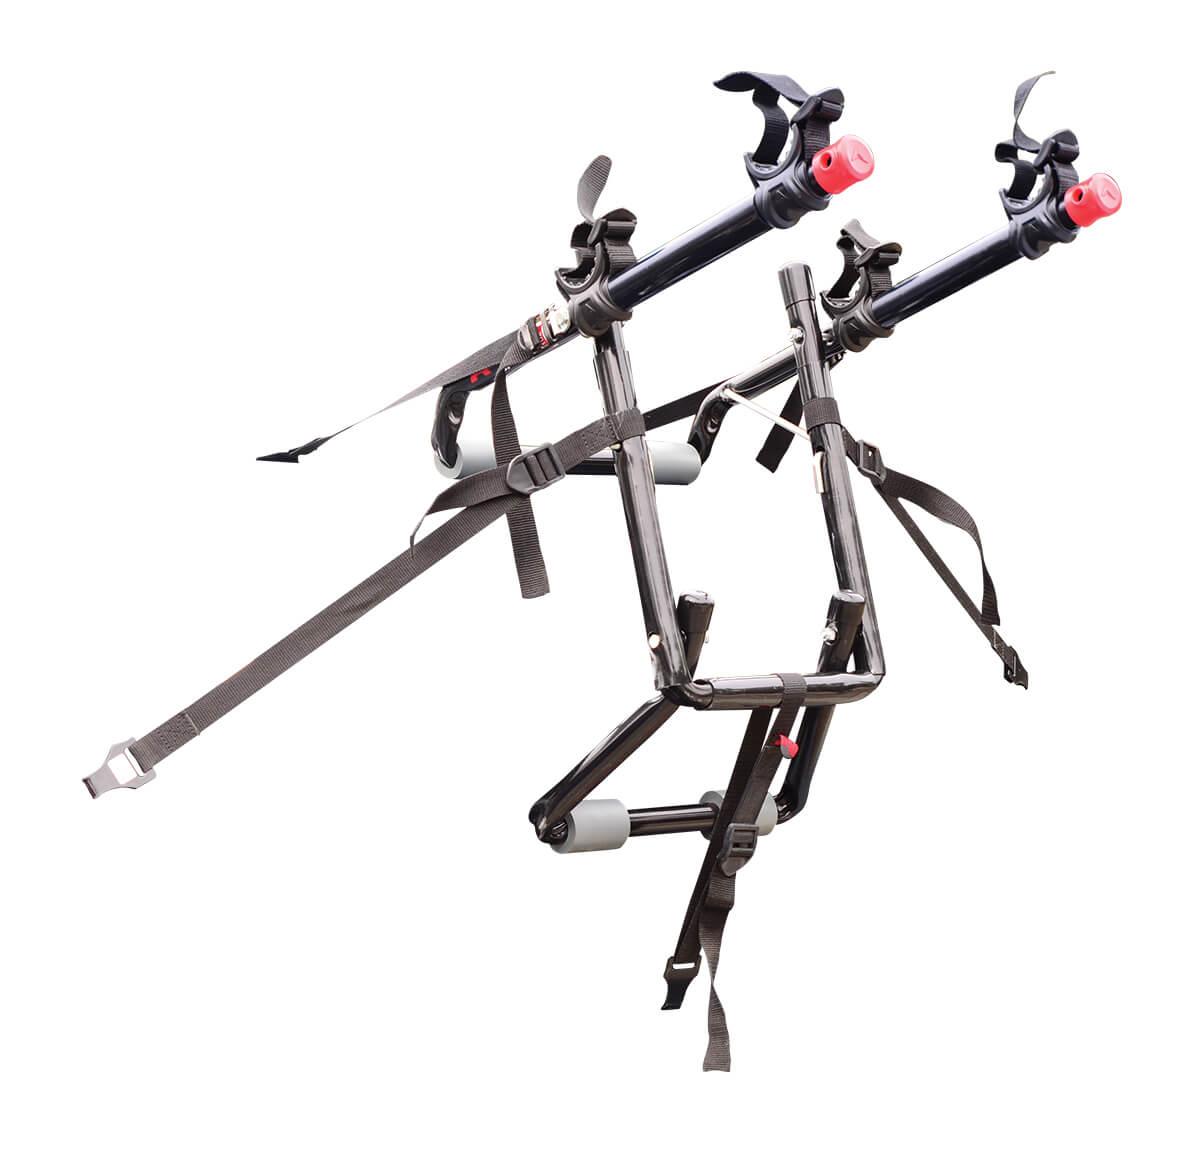 Allen Sports Deluxe 2-Bicycle Trunk Mounted Bike Rack